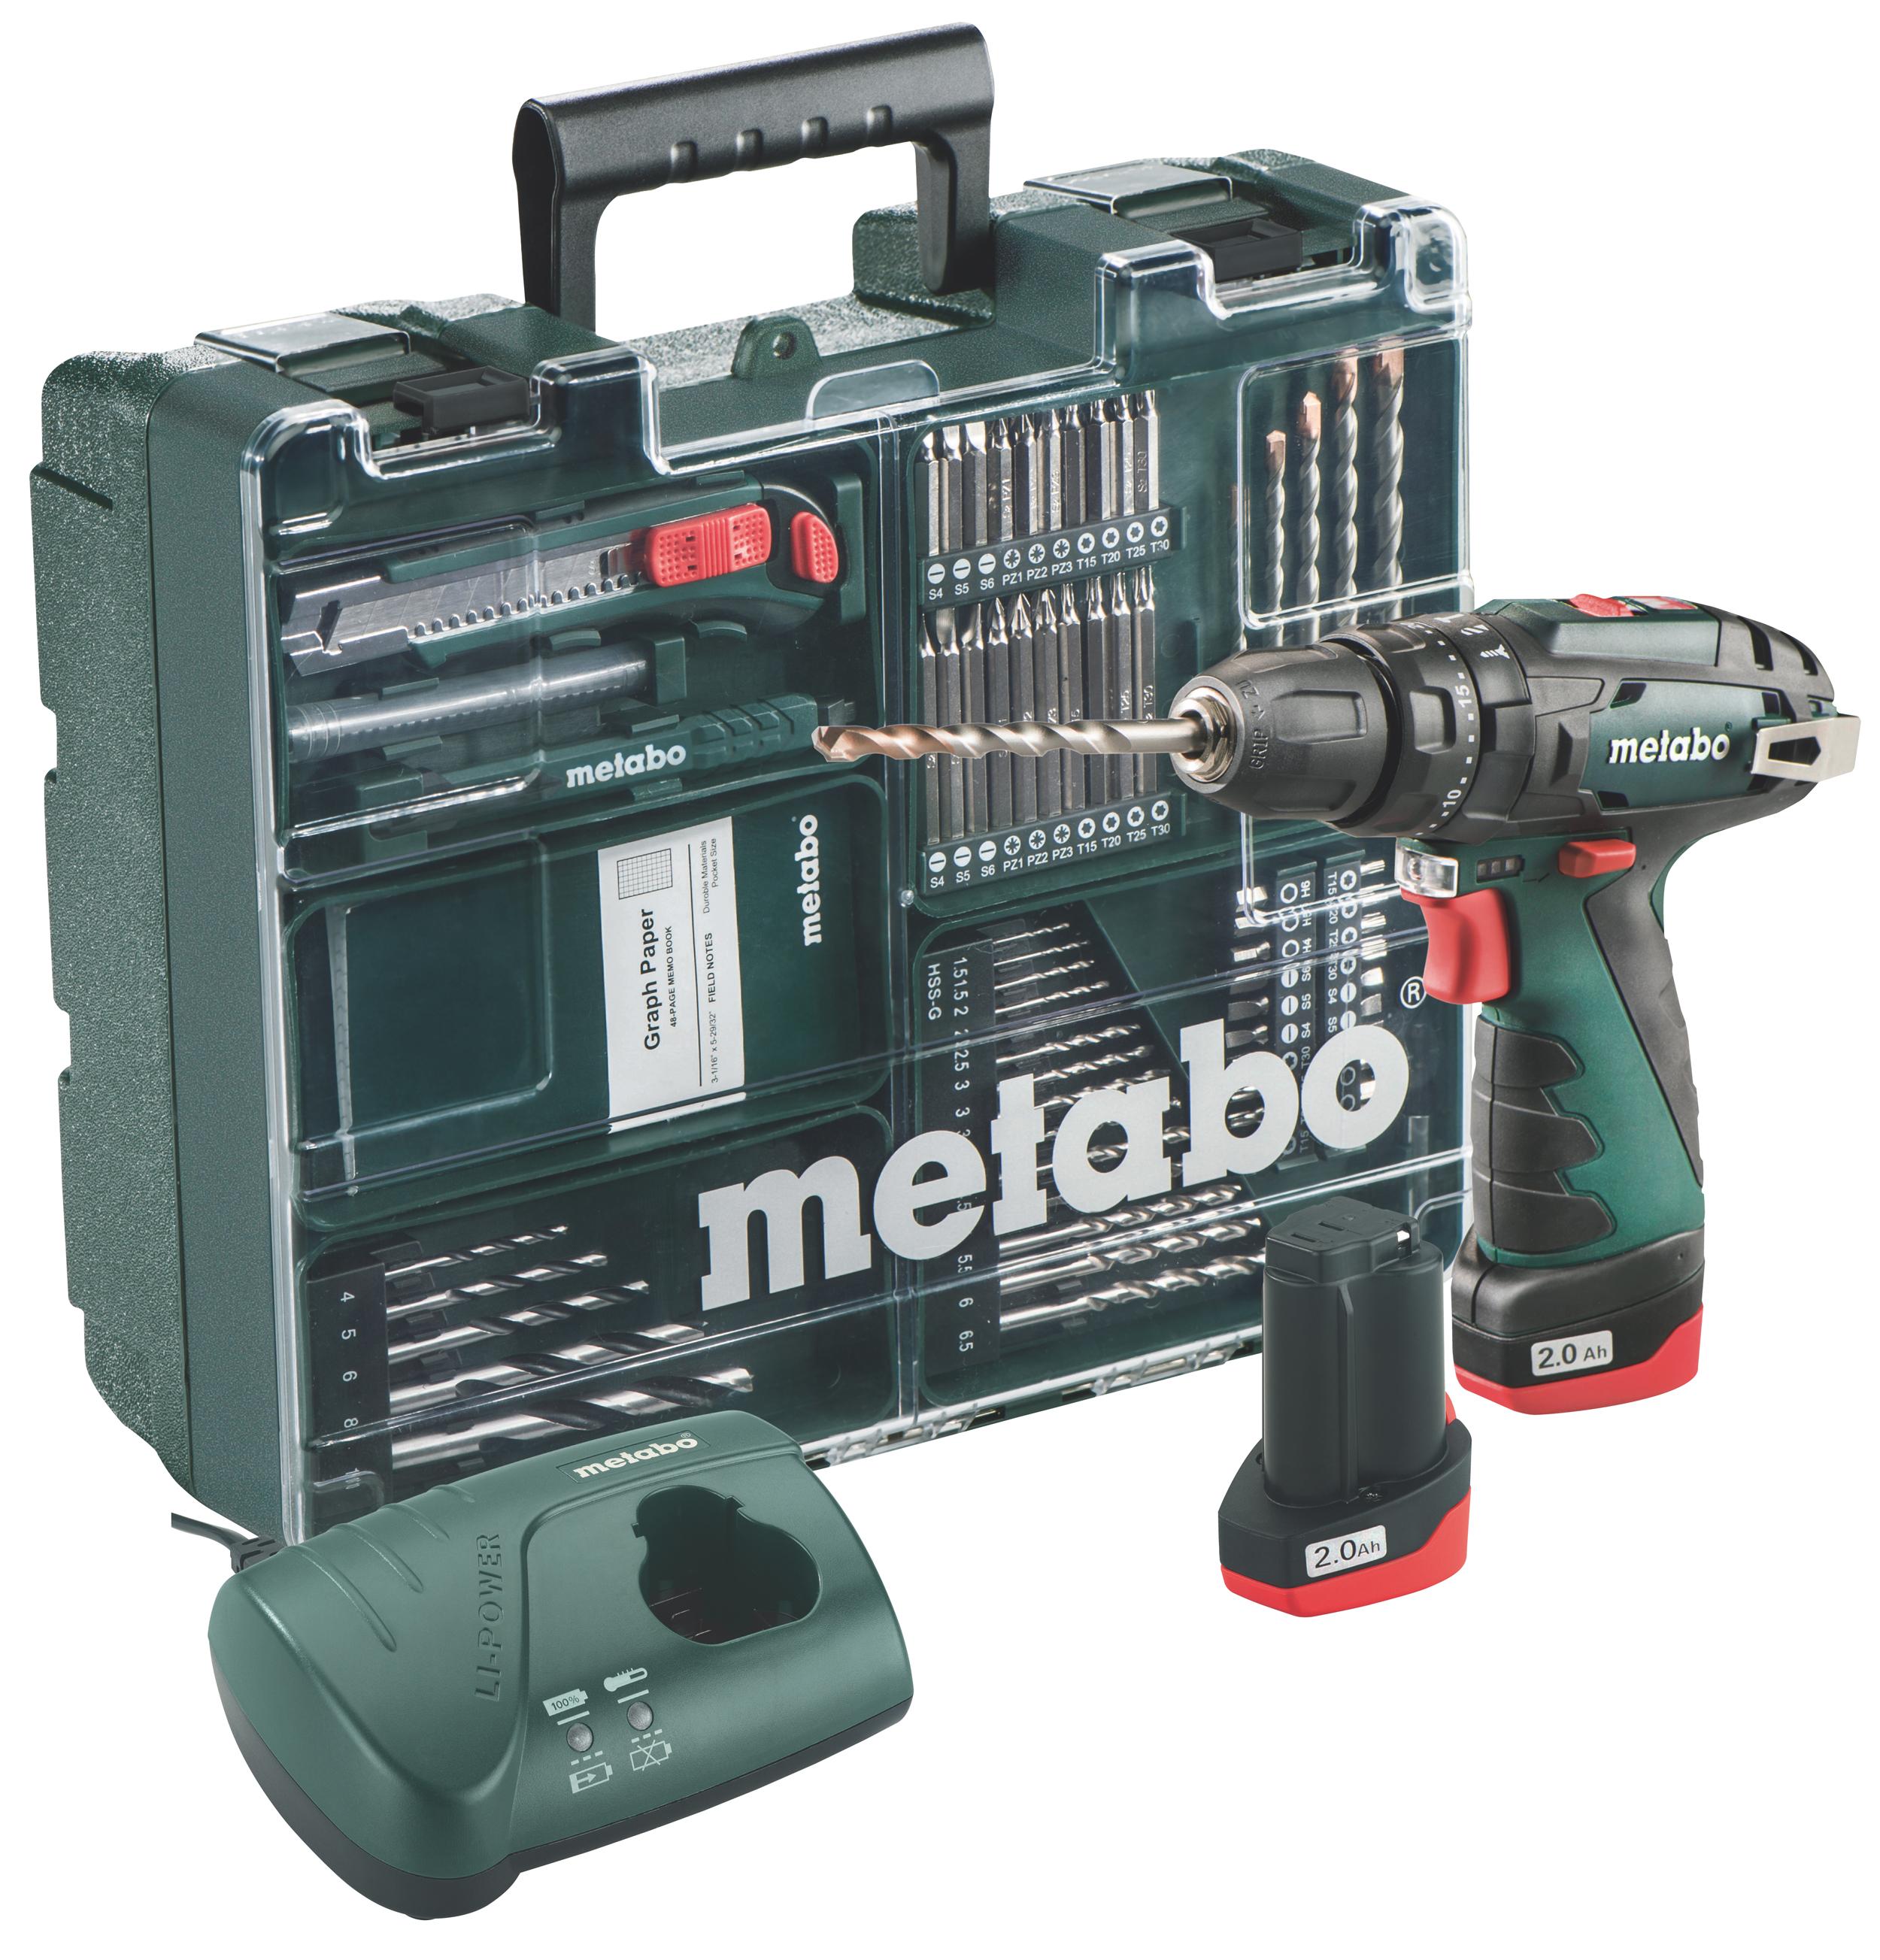 Metabo Akku Schlagbohrmaschine PowerMaxx SB 10,8V / 2Ah Set Aktion Bild 1